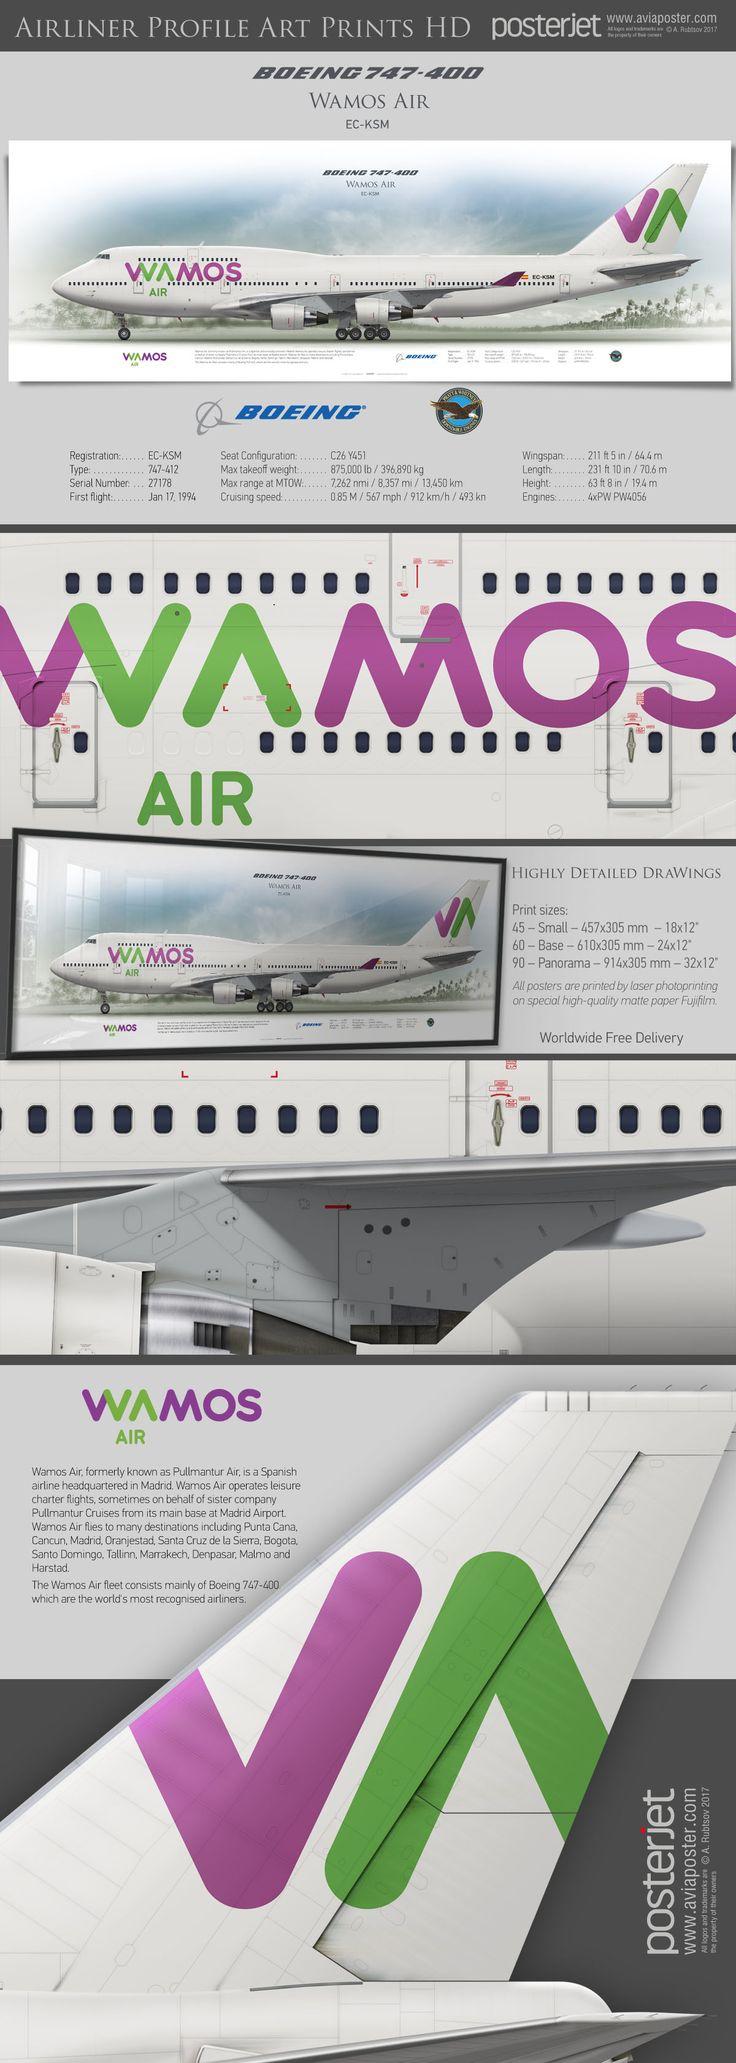 Boeing 747-400 Wamos Air EC-KSM | www.aviaposter.com | #airliners #aviation #jetliner #airplane #pilot #aviationlovers #avgeek #jet #airport #pilotlife #cabincrew #pullmantur